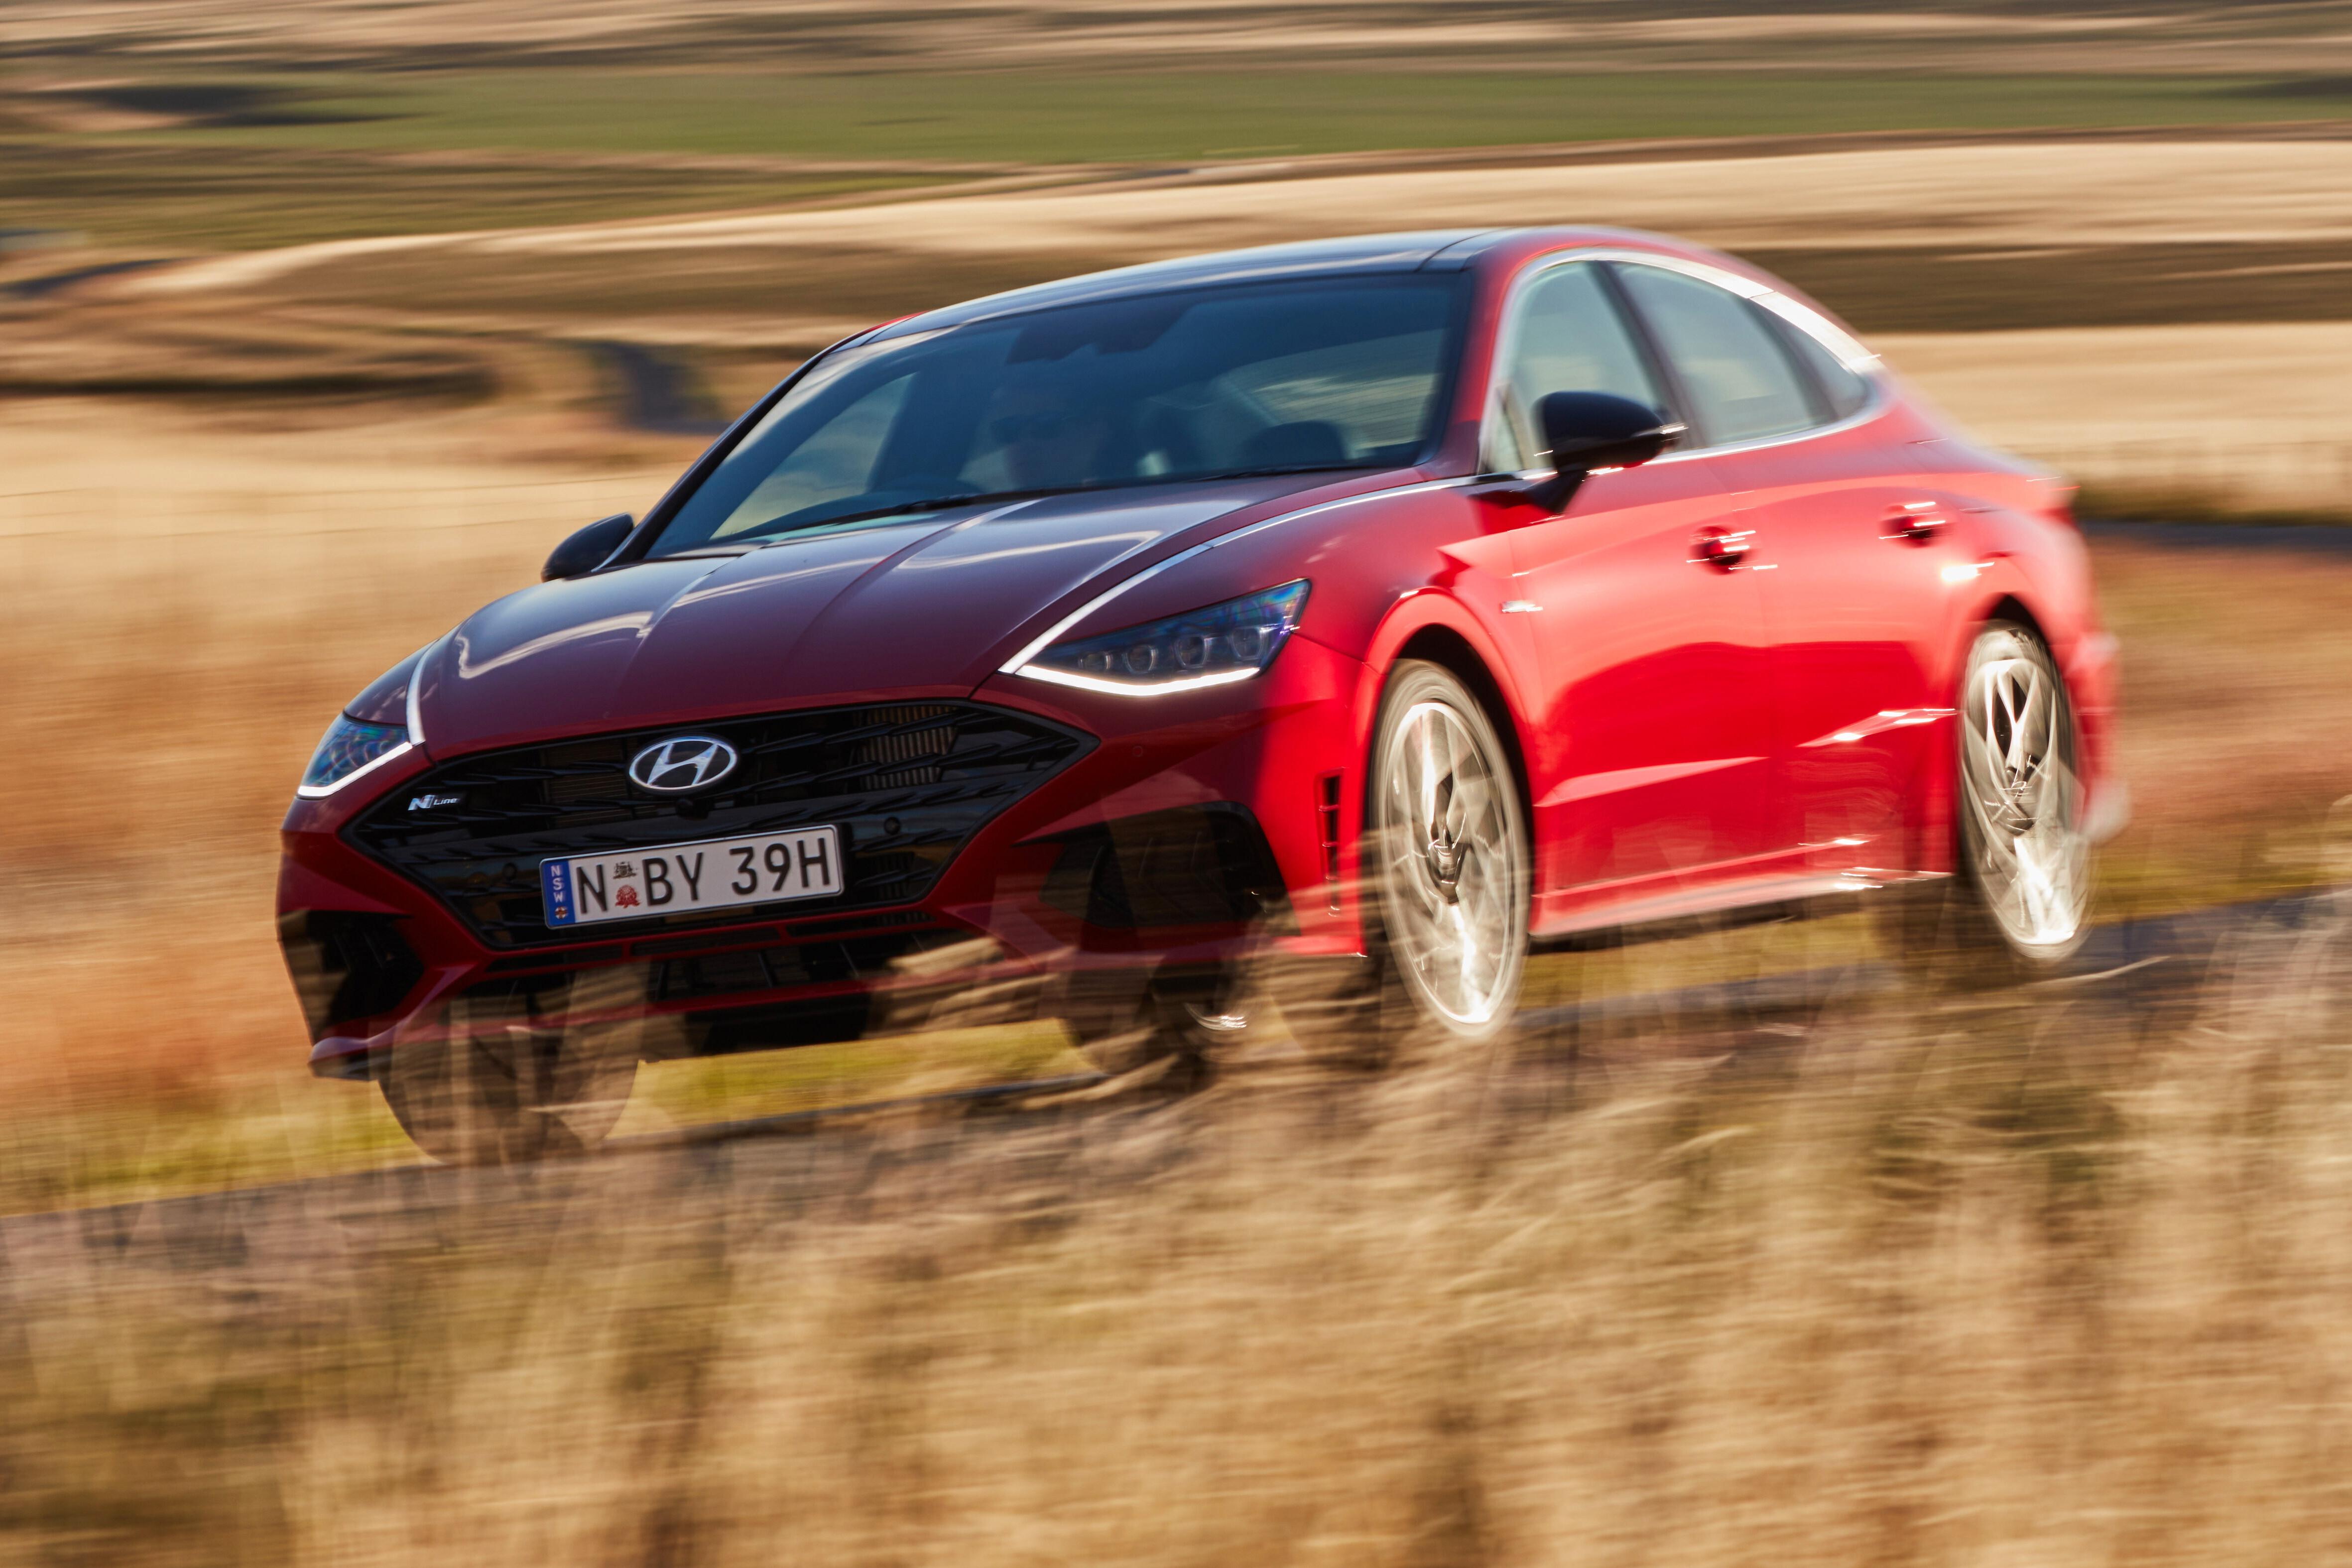 Wheels Reviews 2021 Hyundai Sonata N Line Review Australia 45